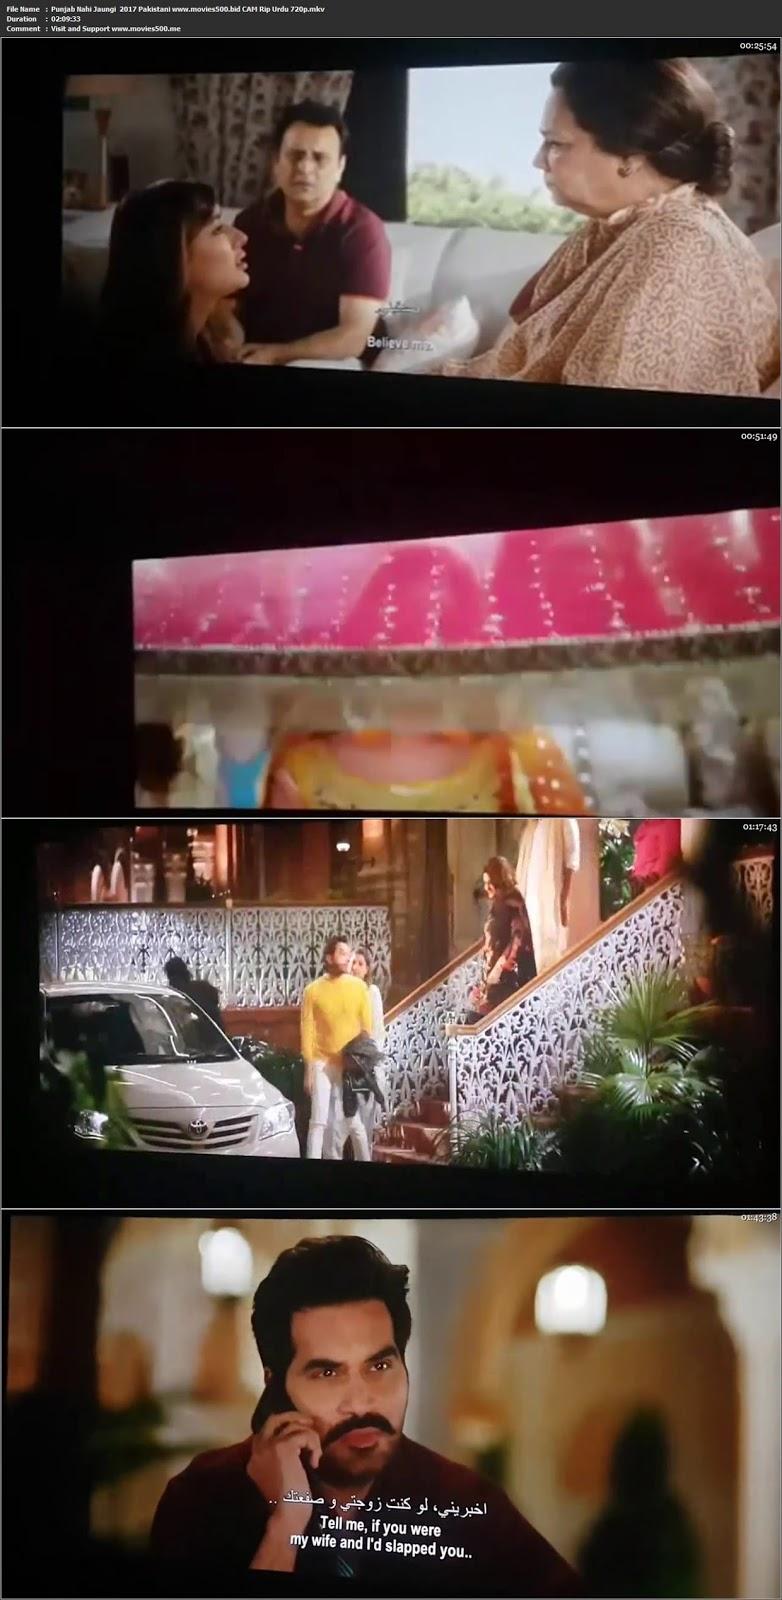 Punjab Nahi Jaungi 2017 Pakistani Full Urdu Movie pDVDRip 720p at teelaunch.co.uk